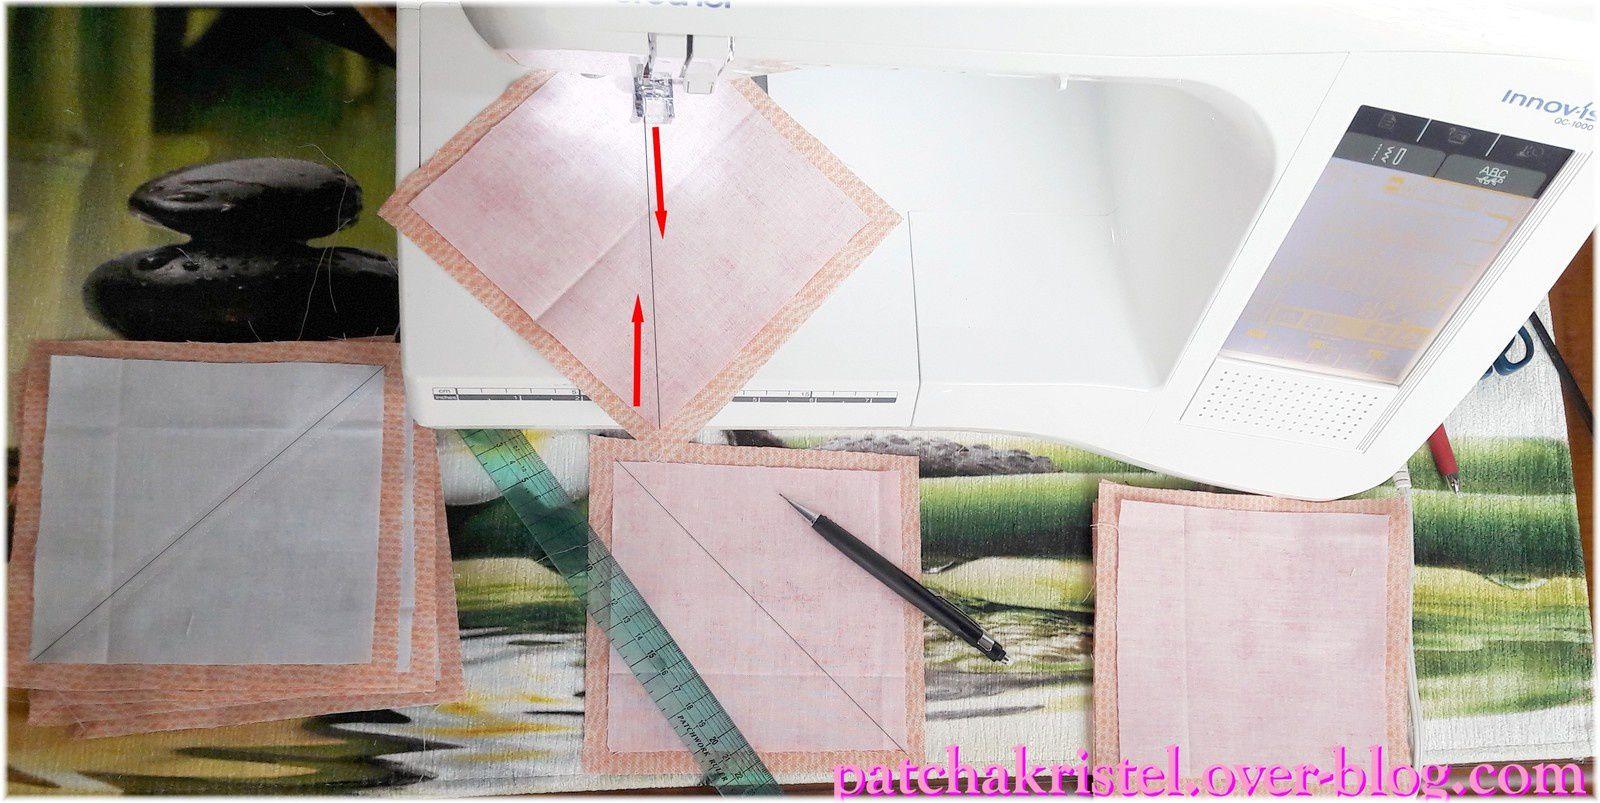 Fil rouge - Ines Patchwork Partie 6